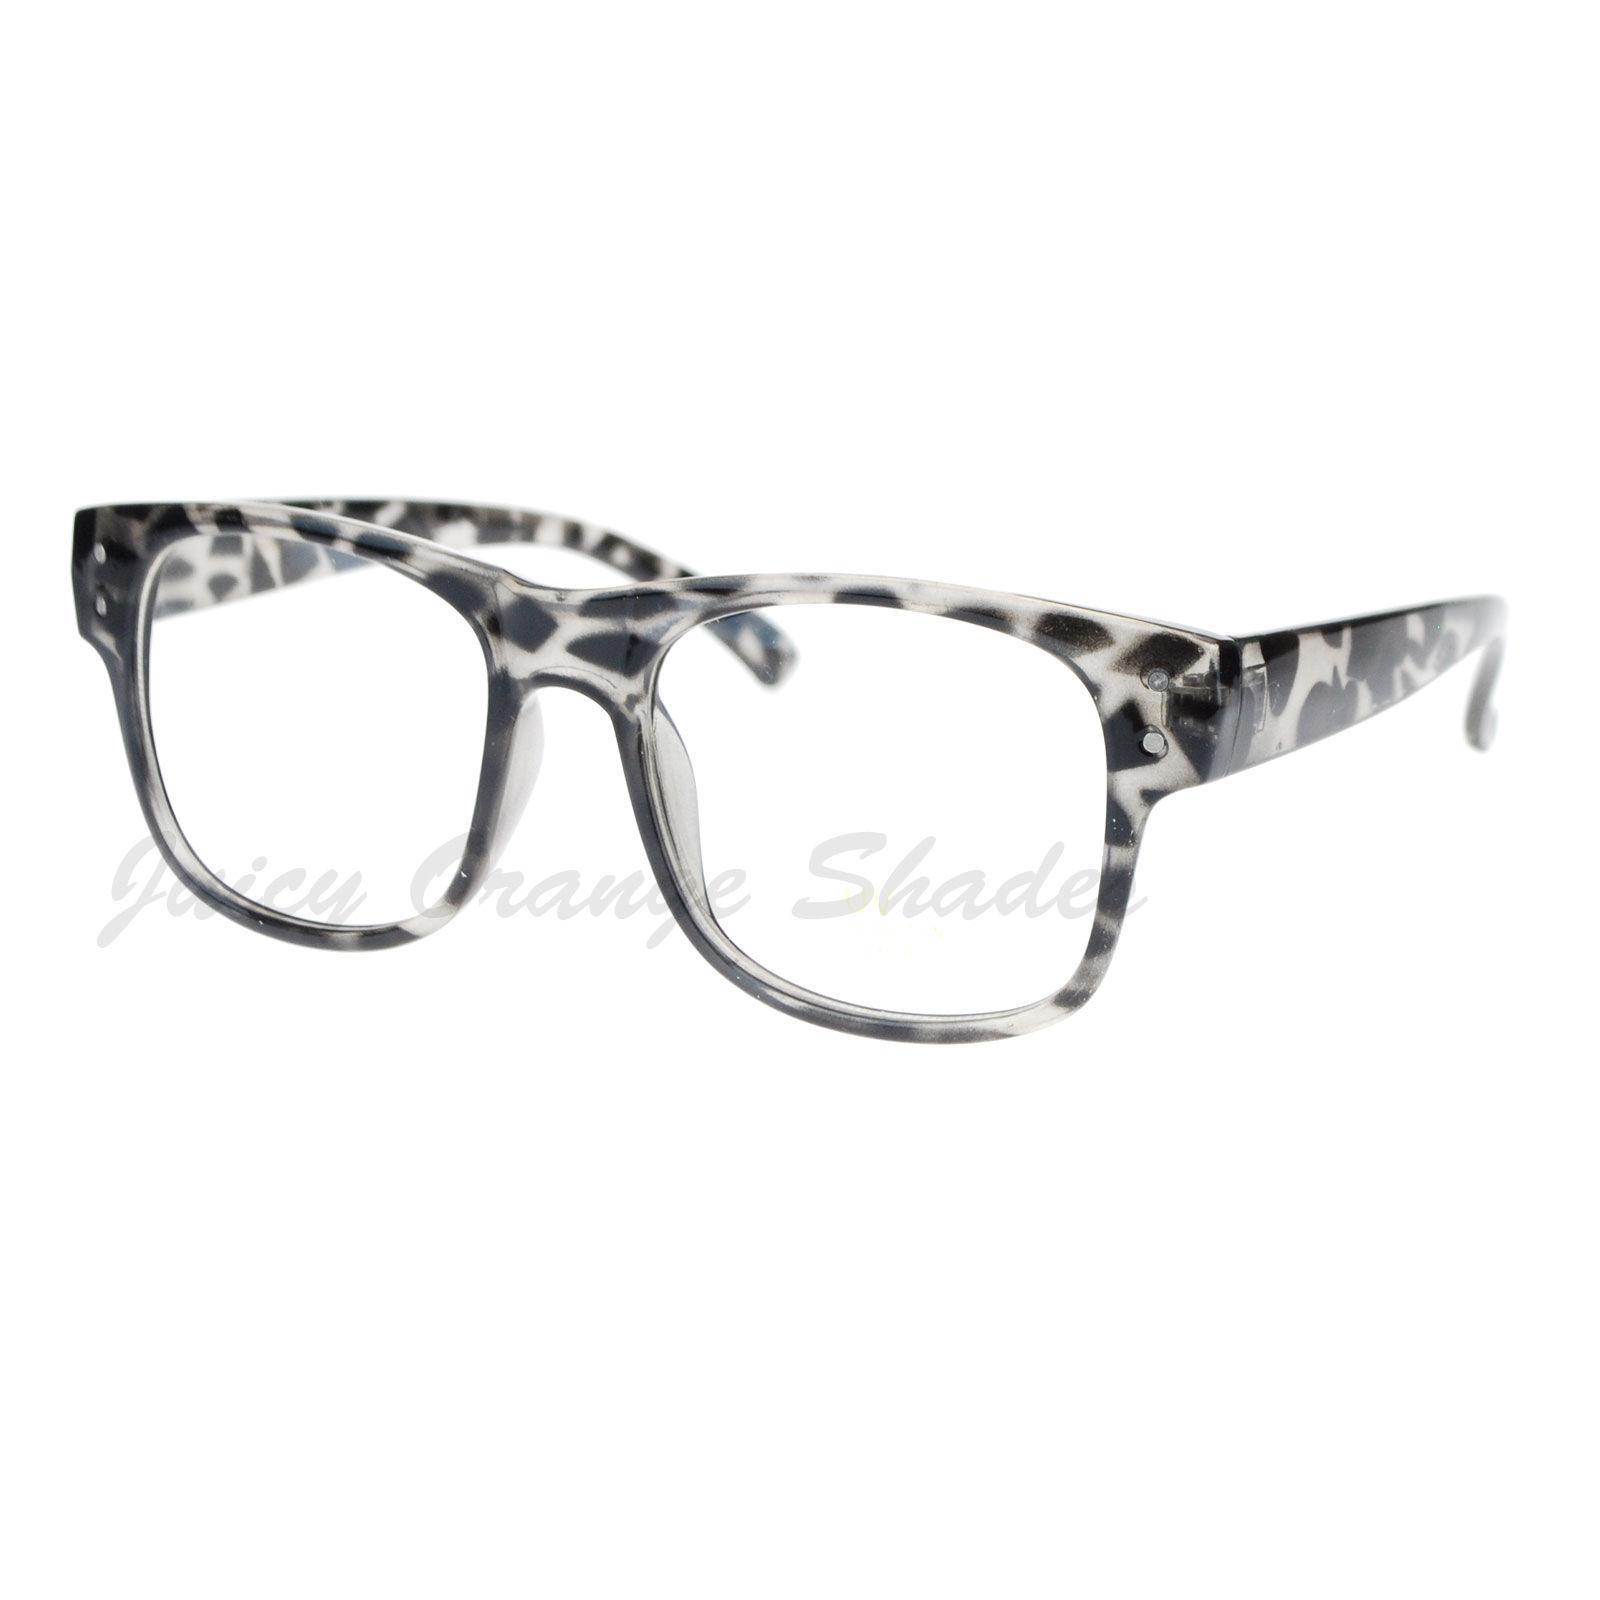 Square Frame Clear Lens Eyeglasses Nerdy Fashion Glasses